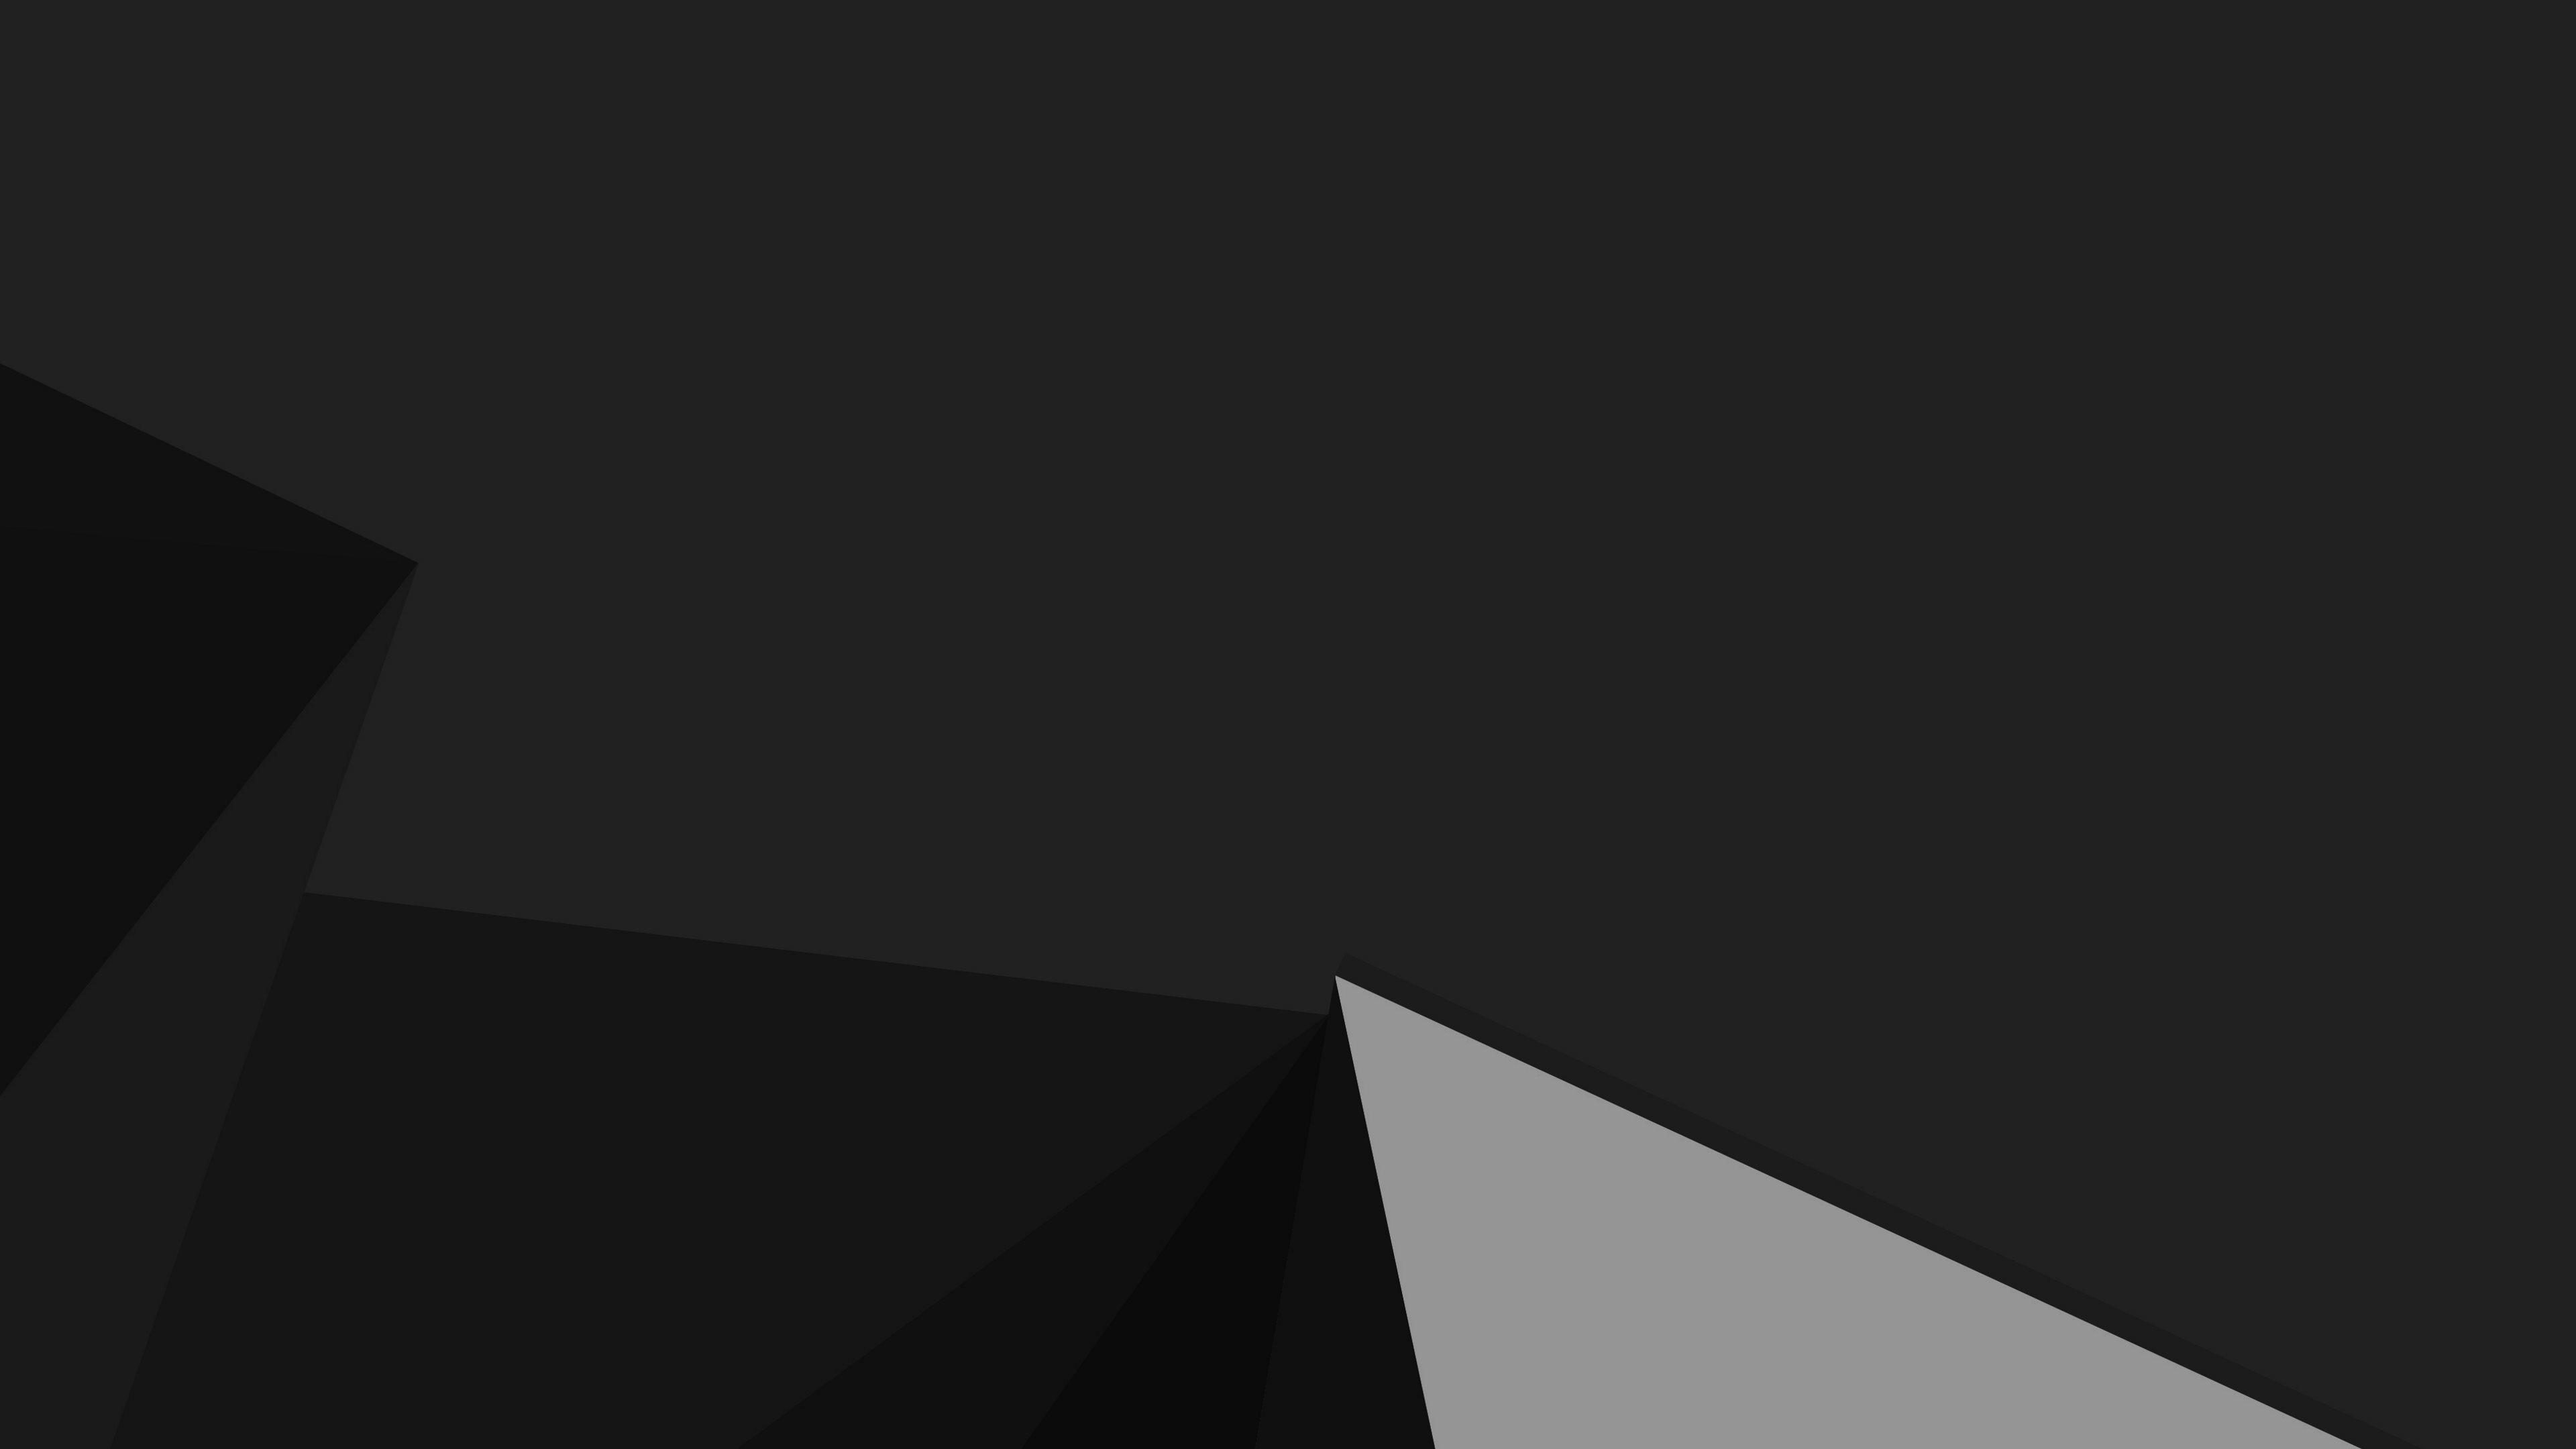 Free Download Minimal Windows 81 Pack Wallpapers Hd